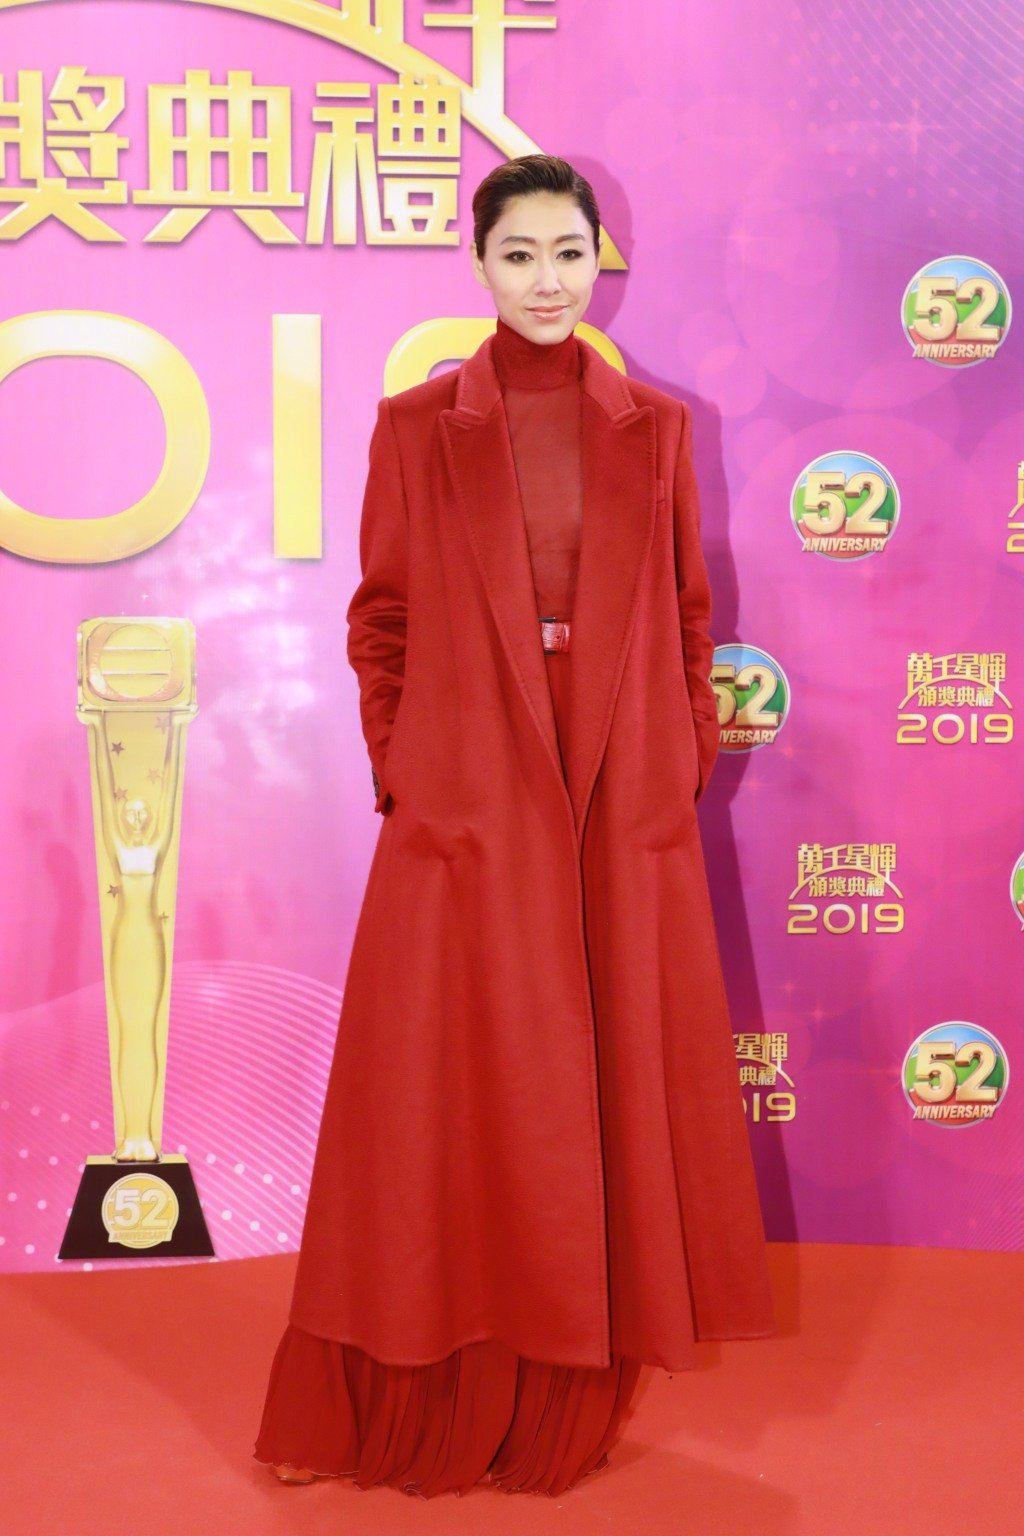 TVB老戏骨高调走红毯,惠英红蕾丝西装意气风发,马国明终封帝